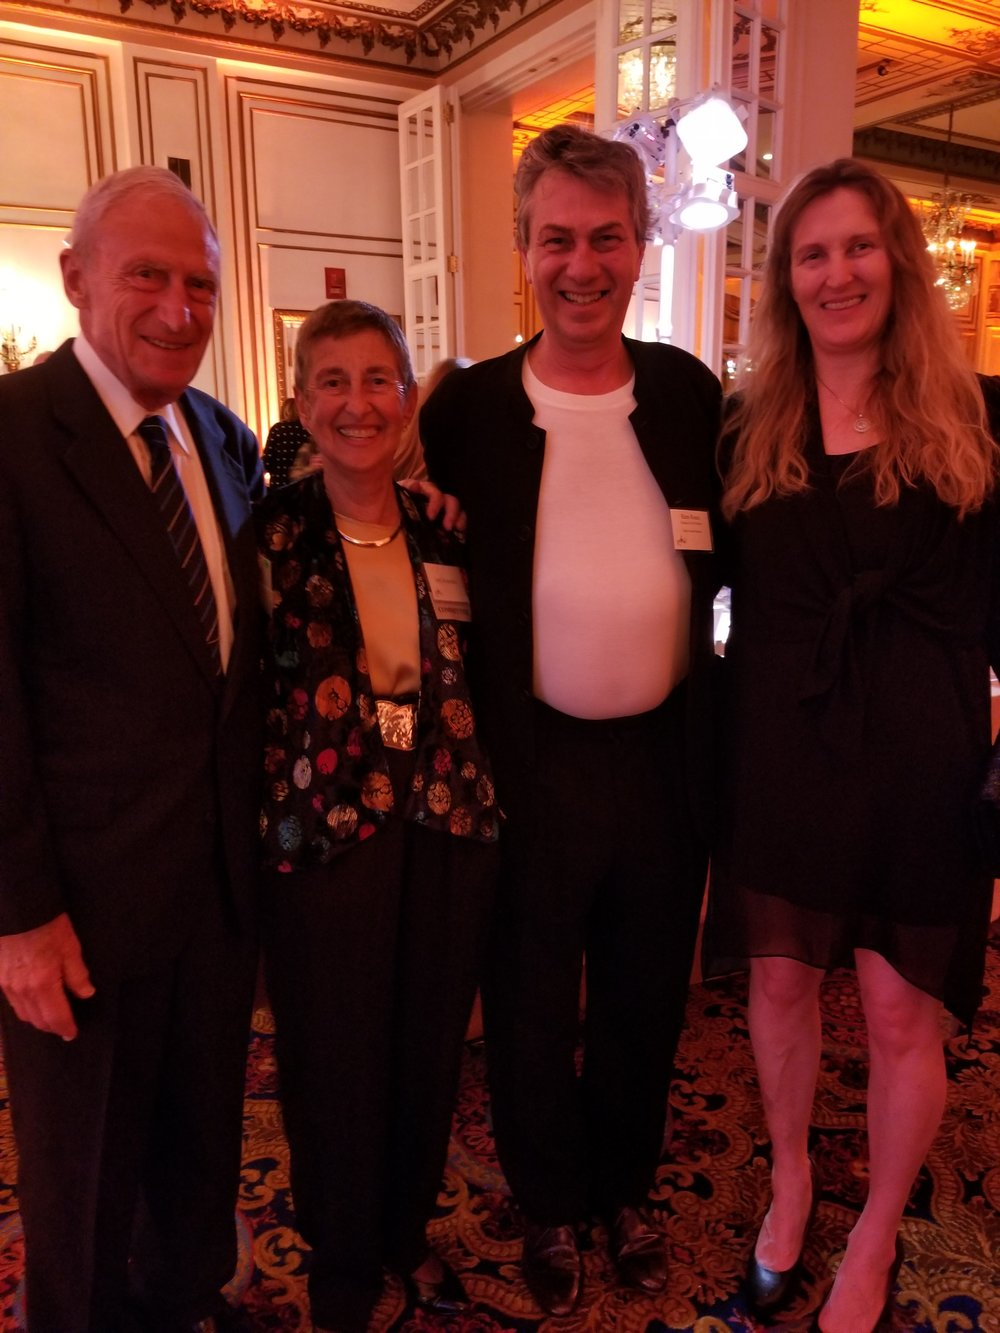 DR. DAVID ROSENTHAL, JUDY ROSENTHAL, RAMEL & ILANA